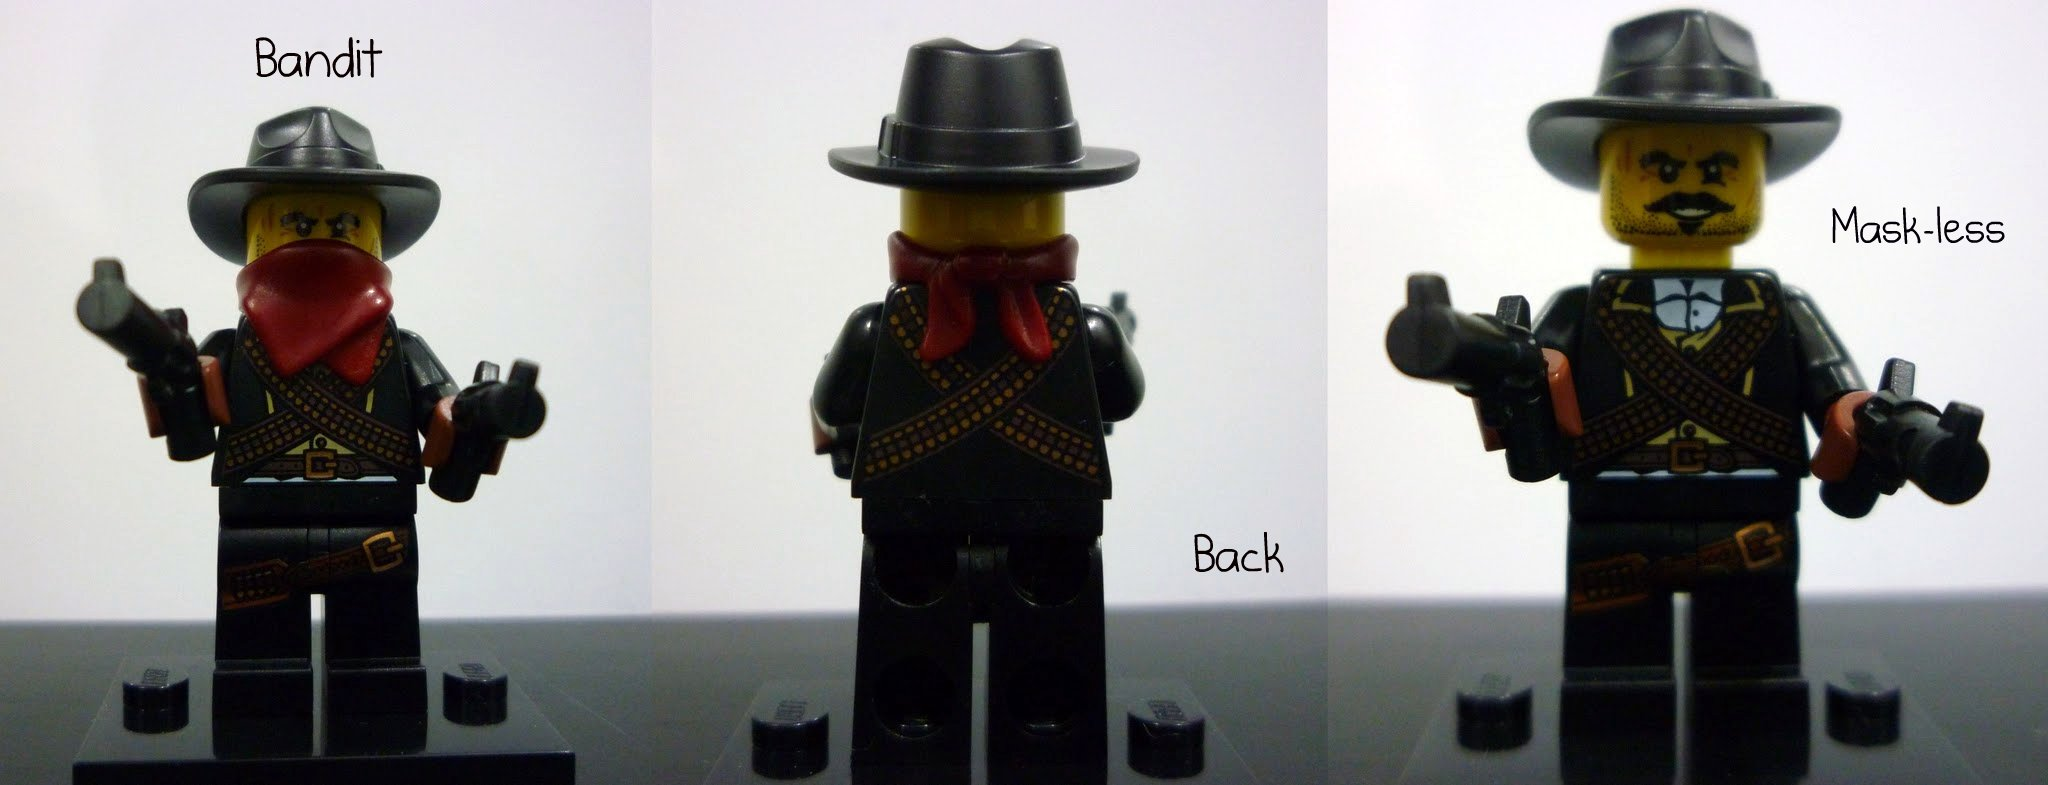 NEW LEGO MINIFIGURES SERIES 6 8827 Bandit